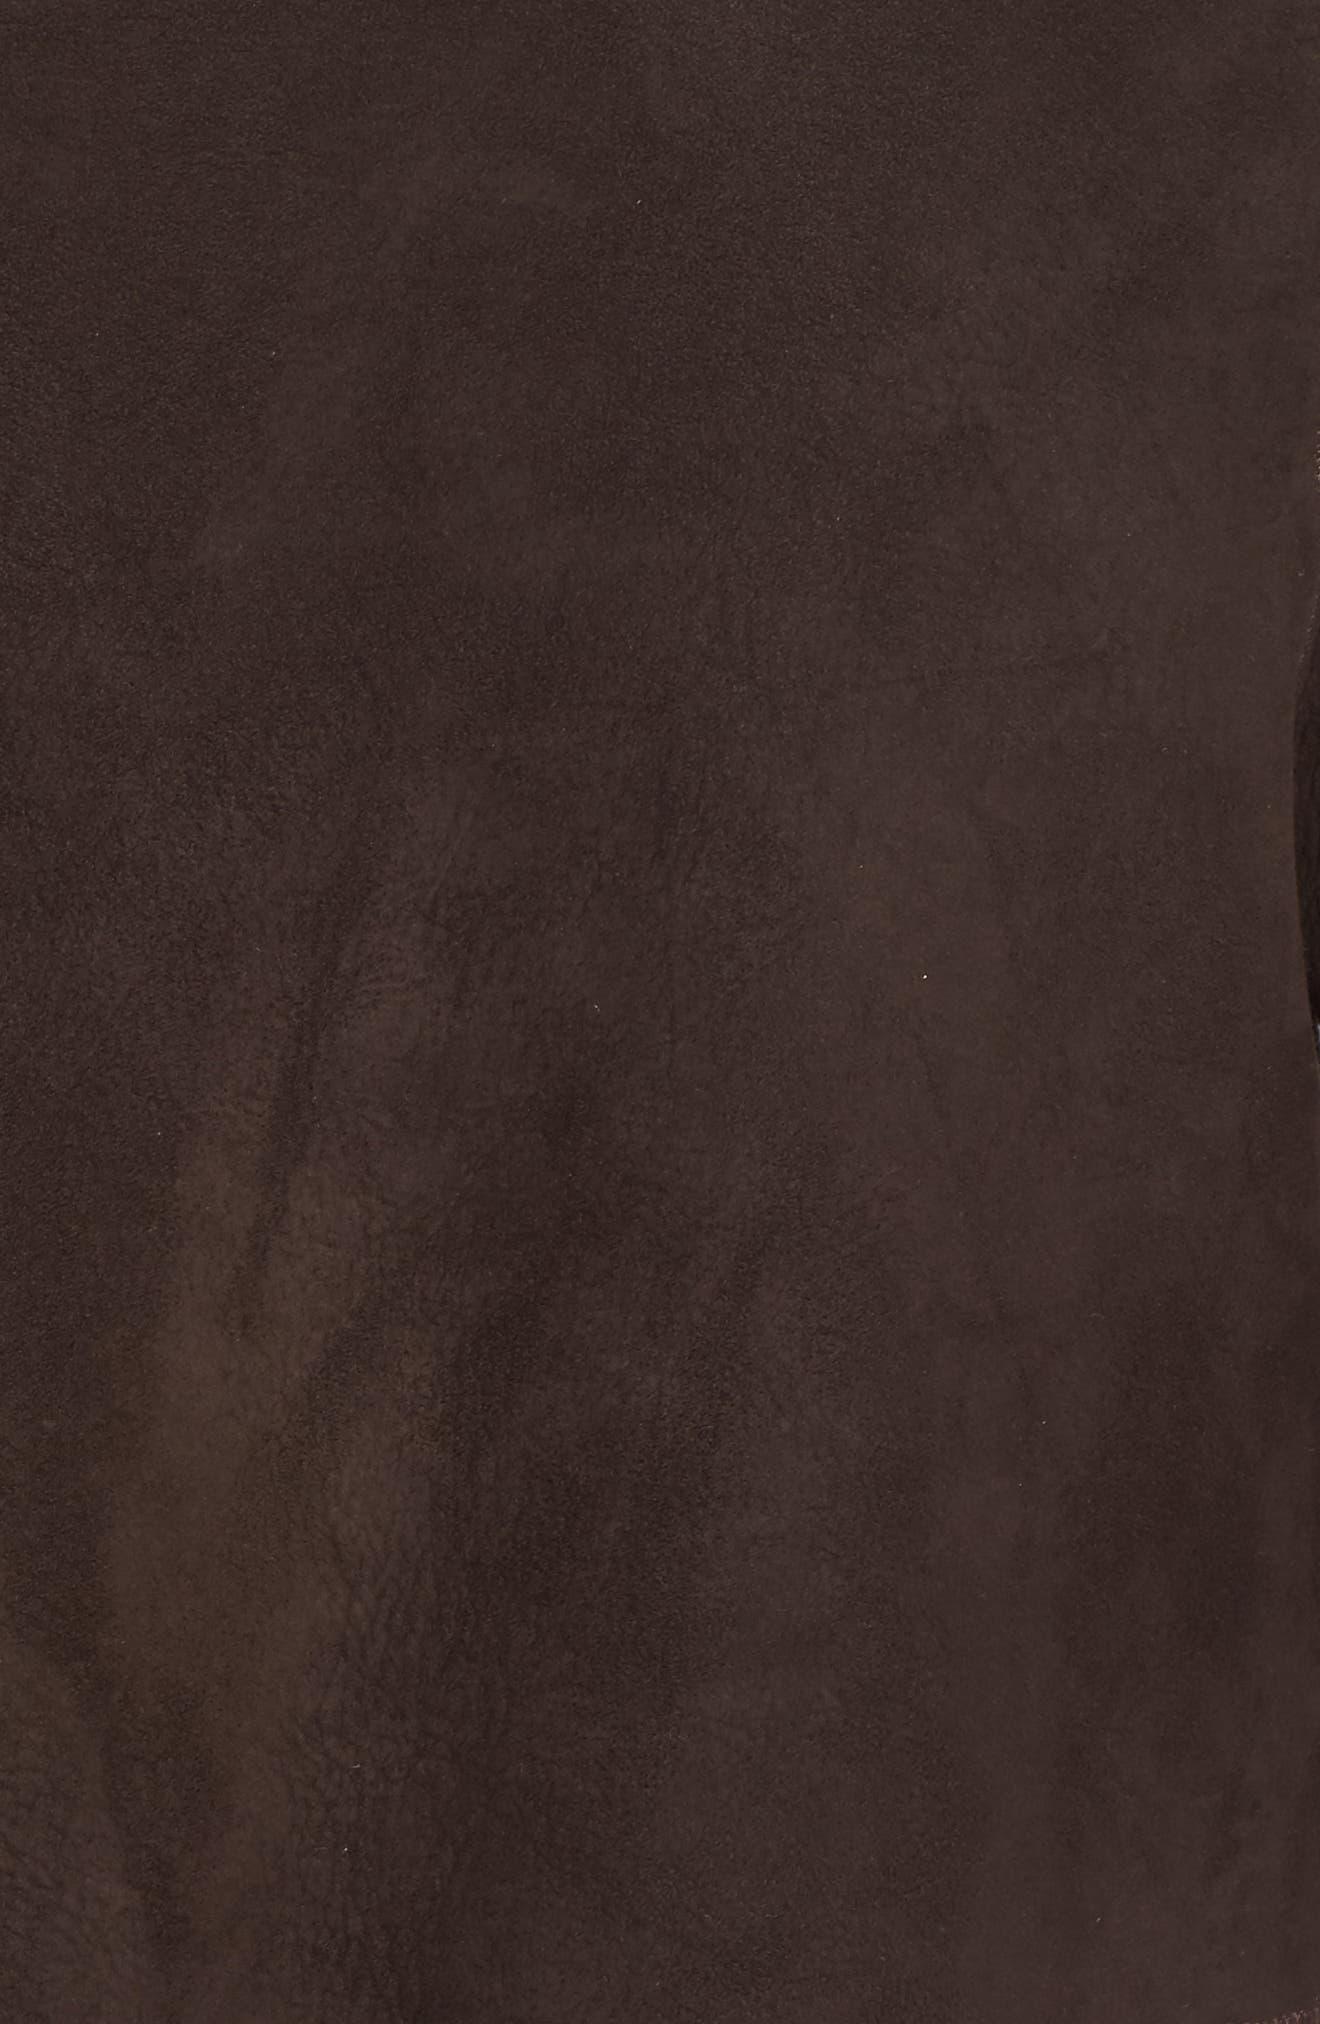 Hooded Genuine Shearling Coat,                             Alternate thumbnail 6, color,                             206